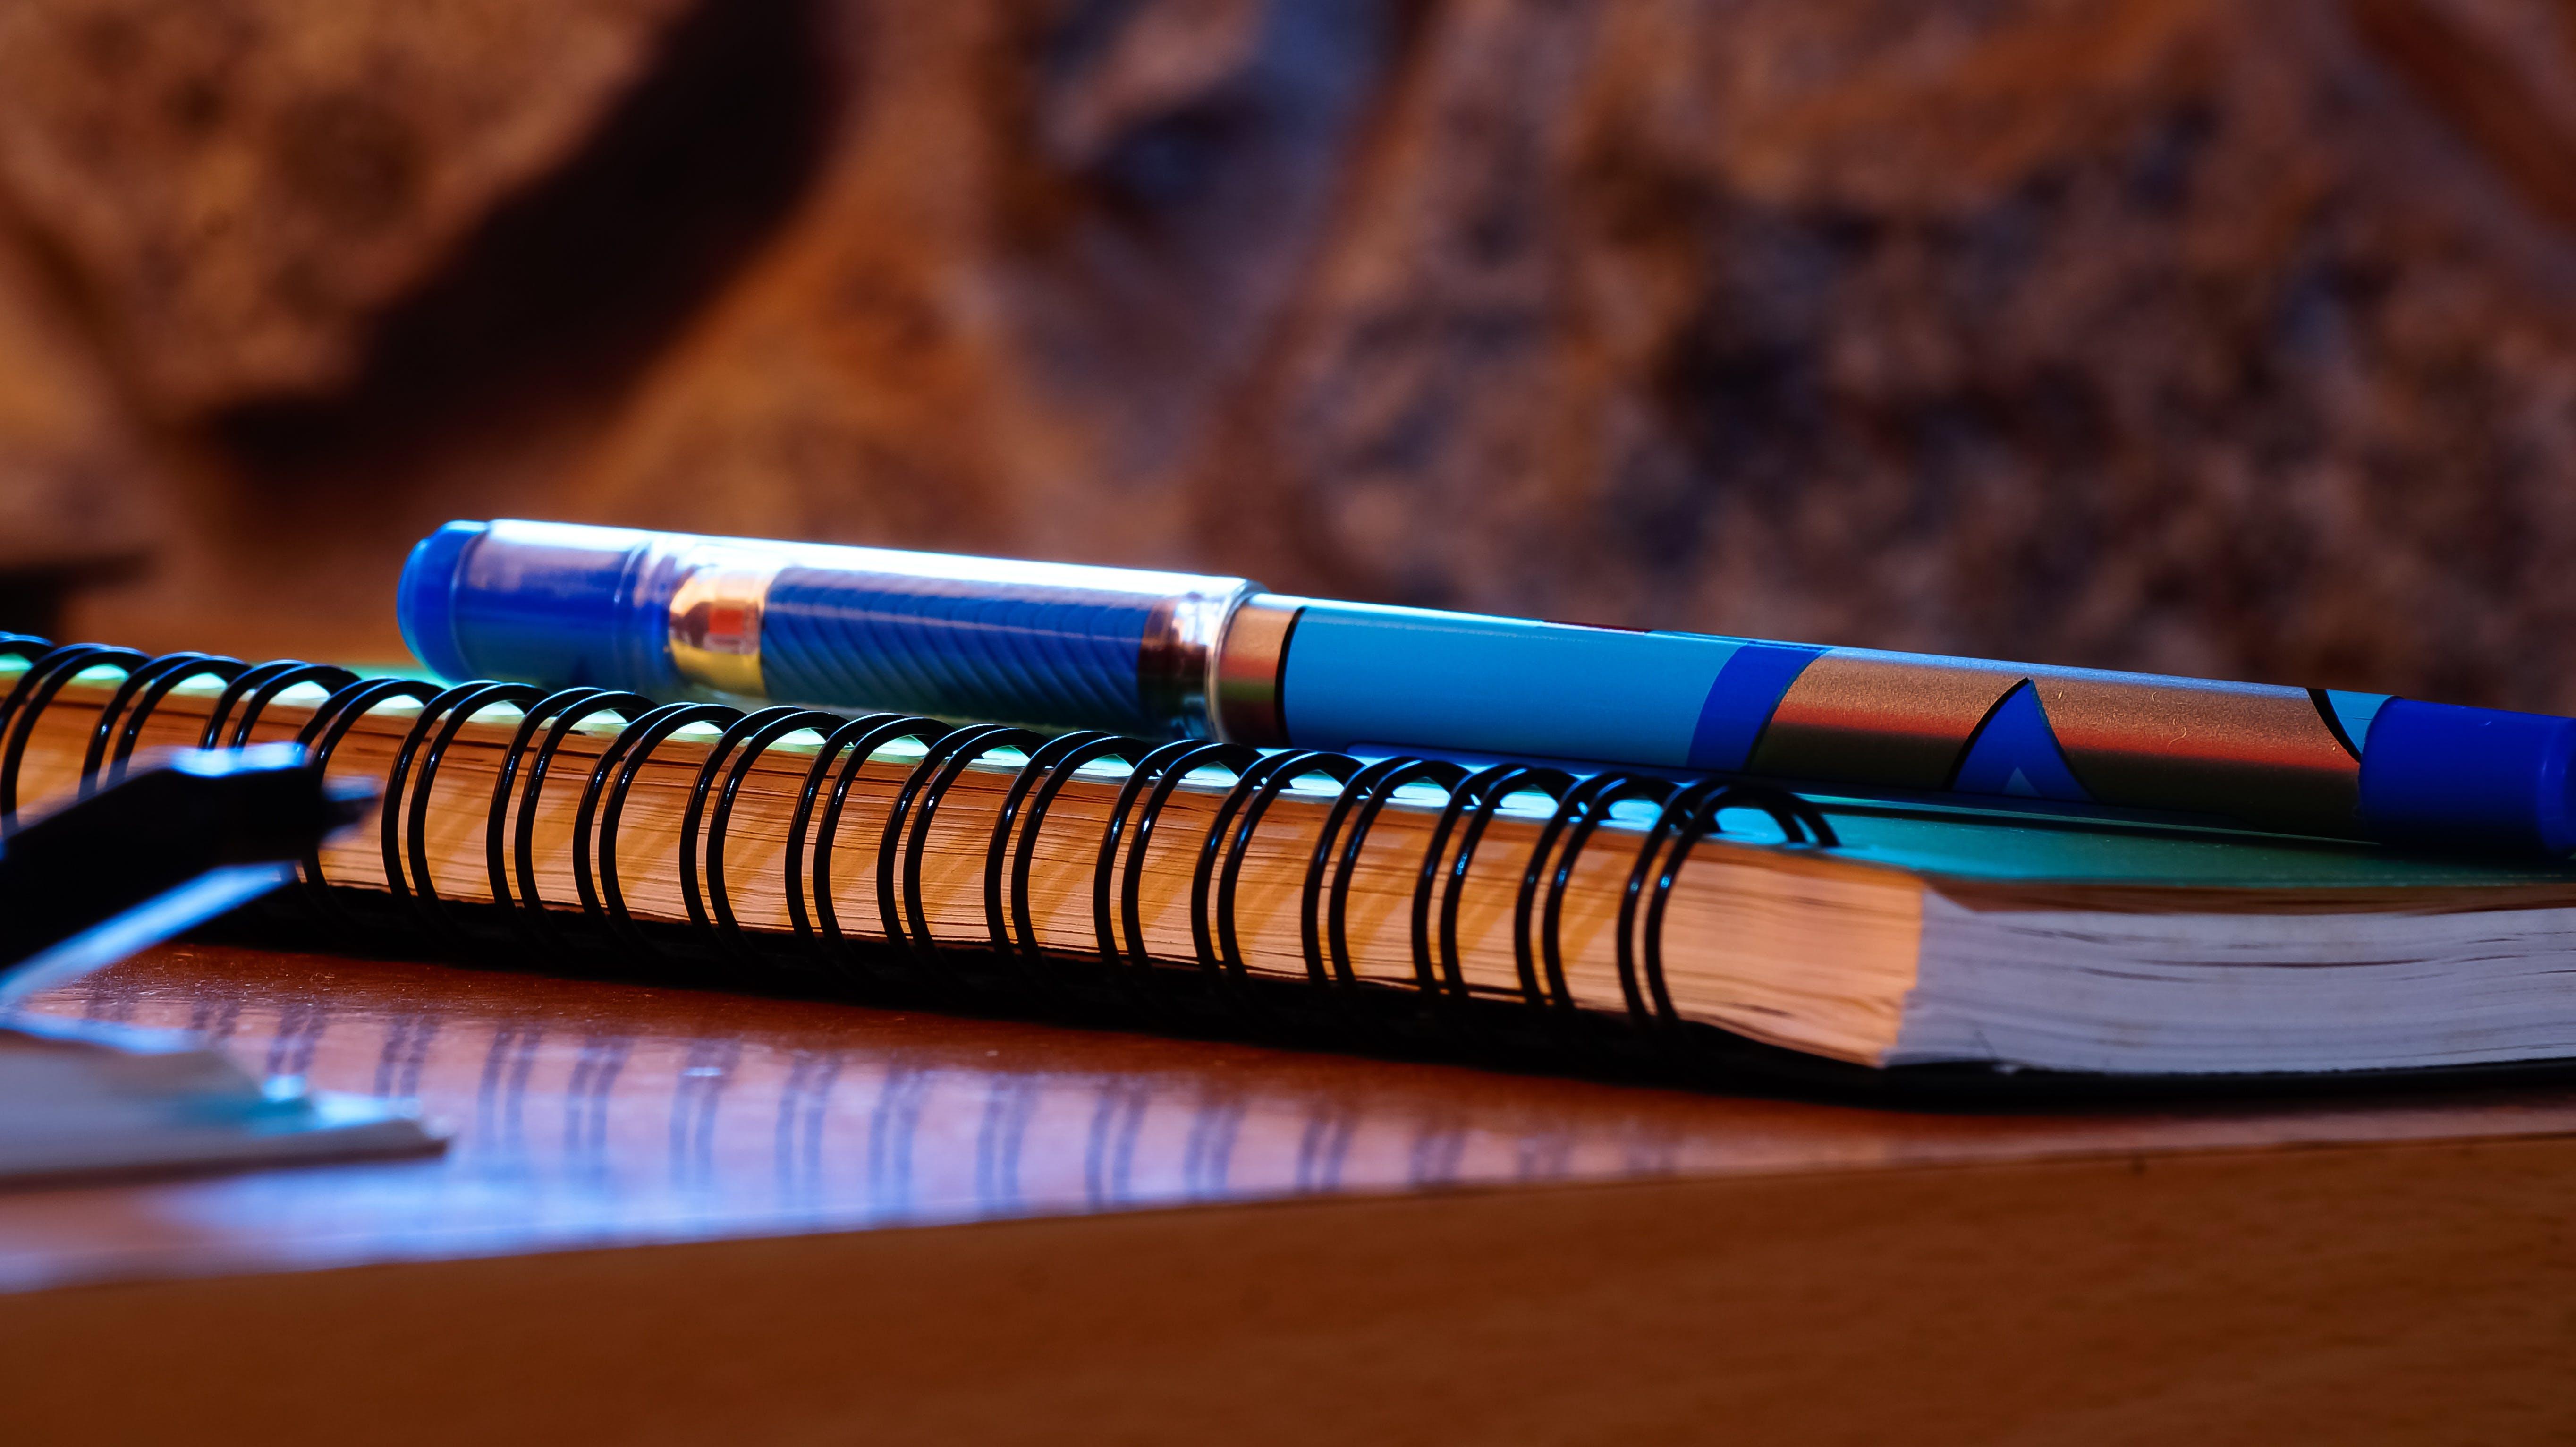 close-up, desk, notebook